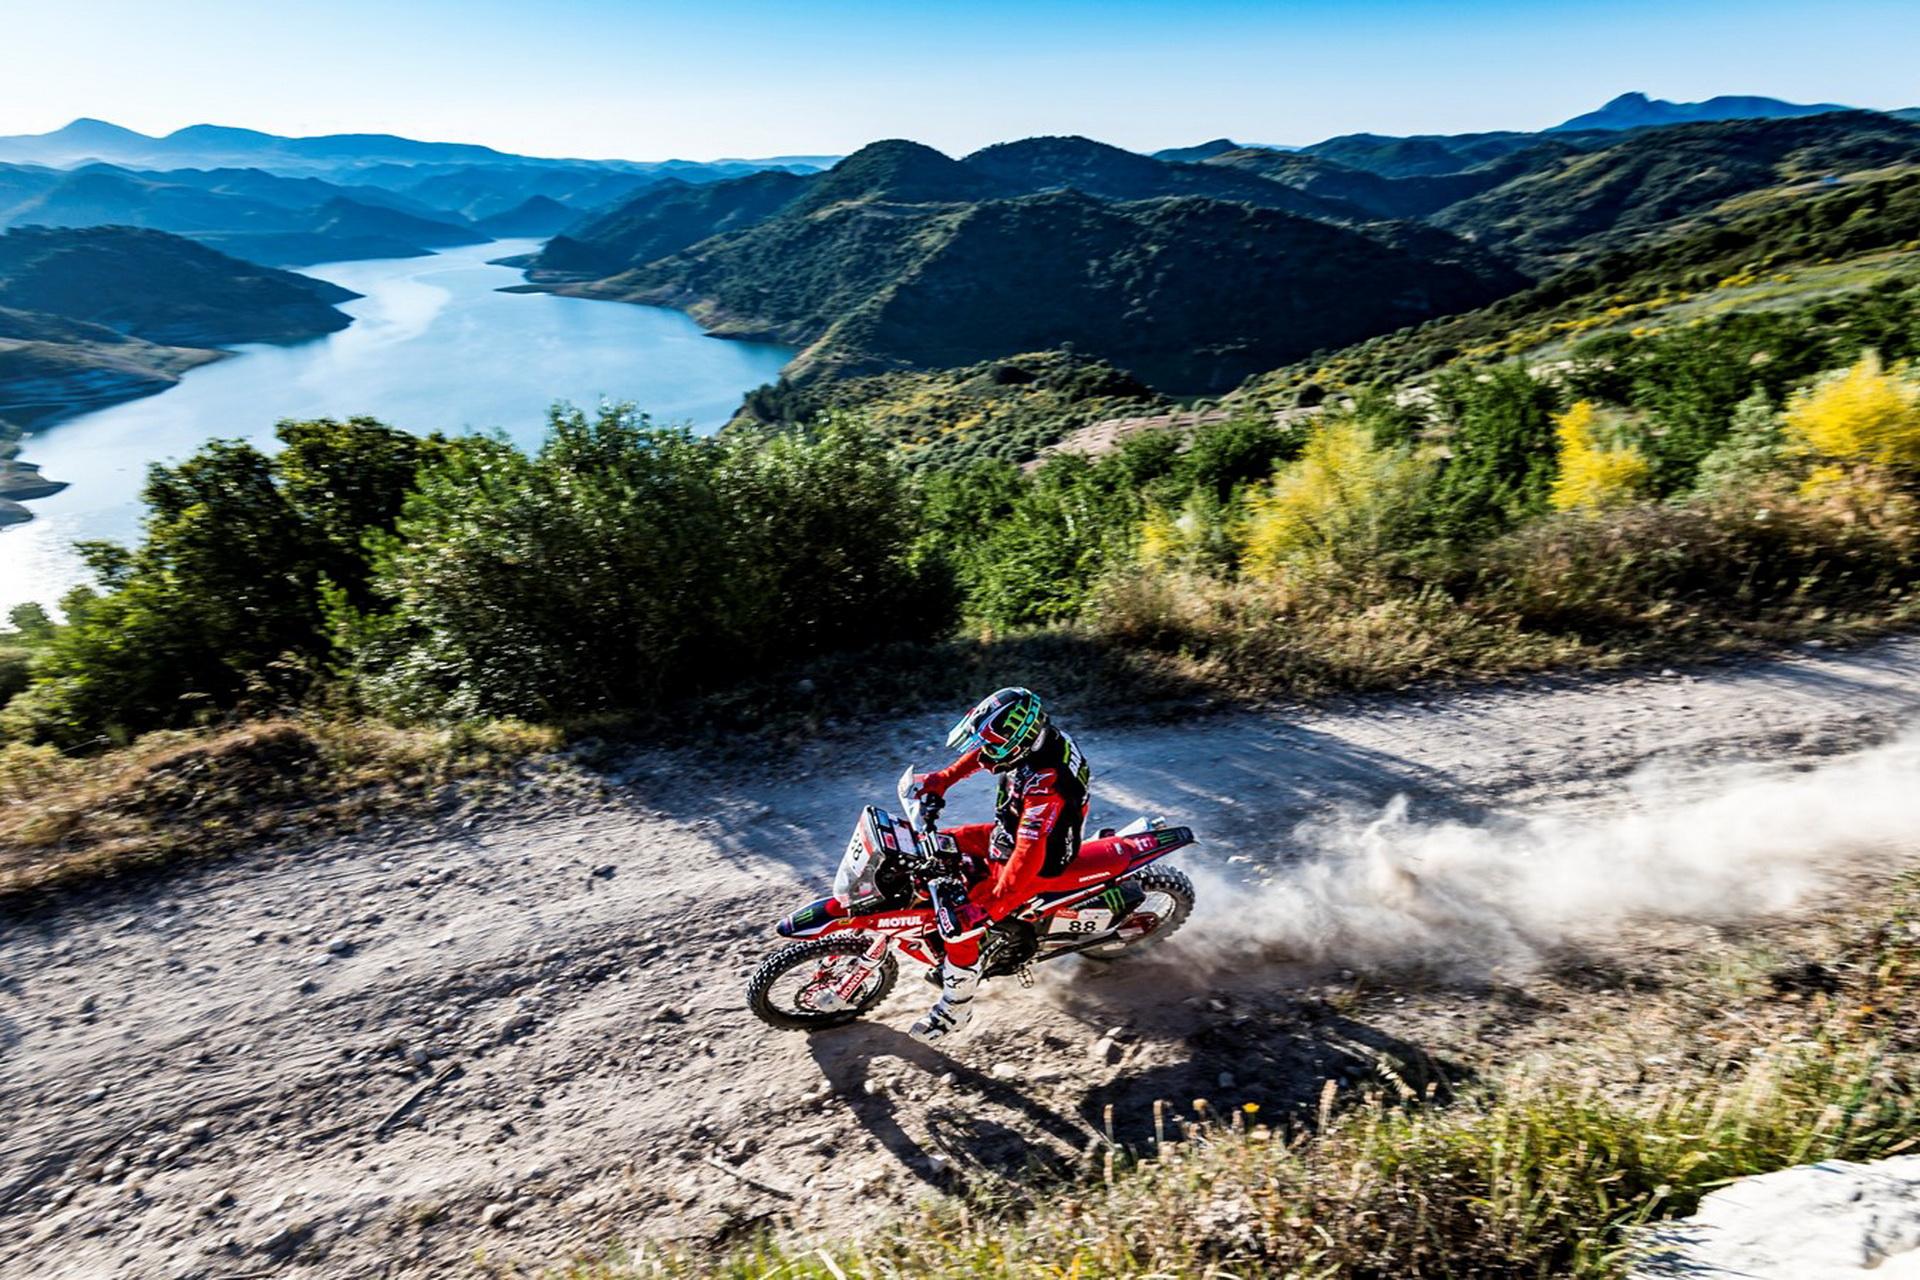 Победители ралли «Дакар» в Андалусии в классе мотоциклов